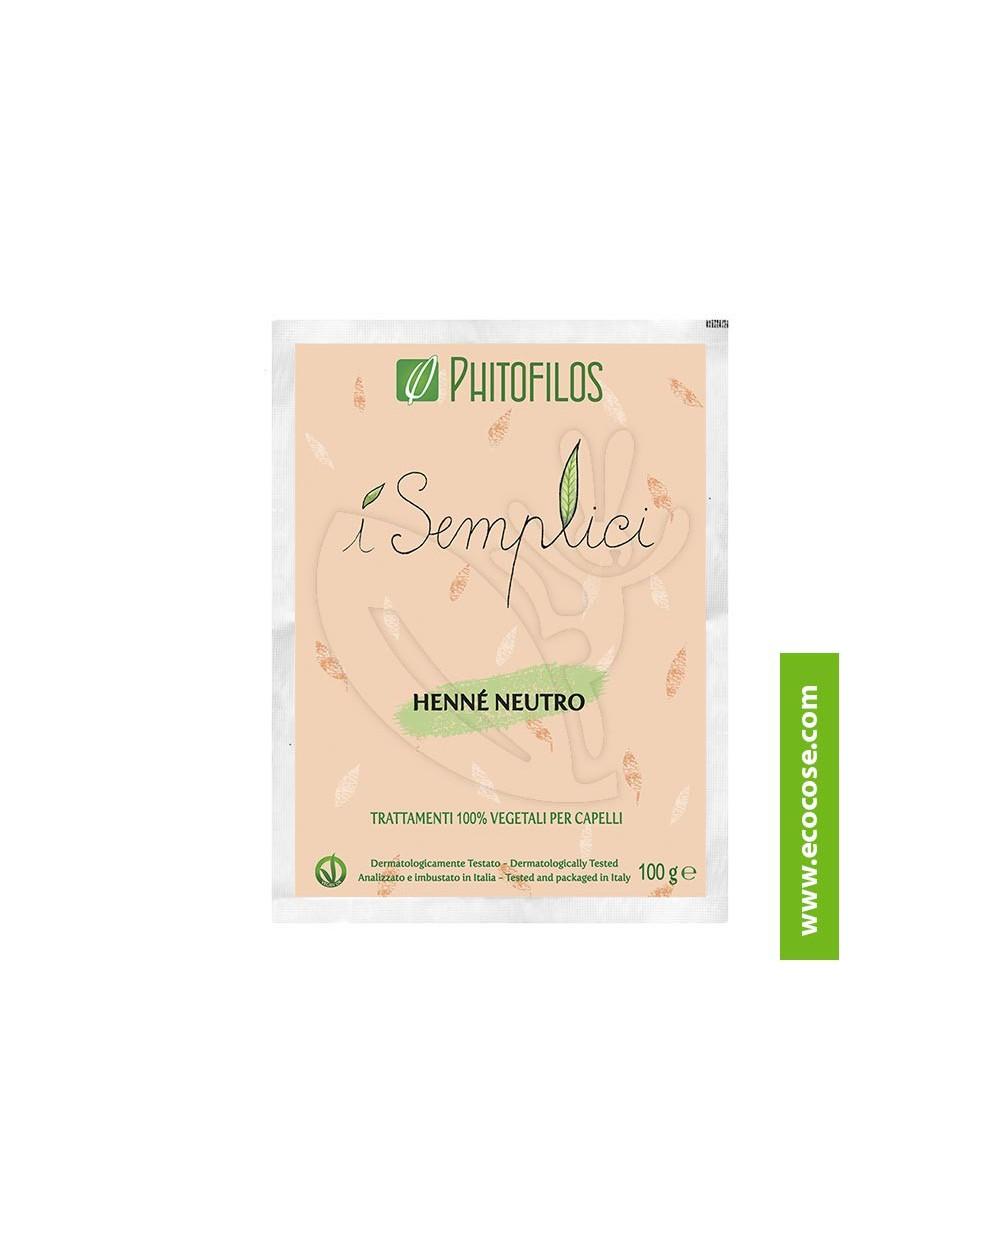 Phitofilos - I semplici - Henné Neutro (Cassia)